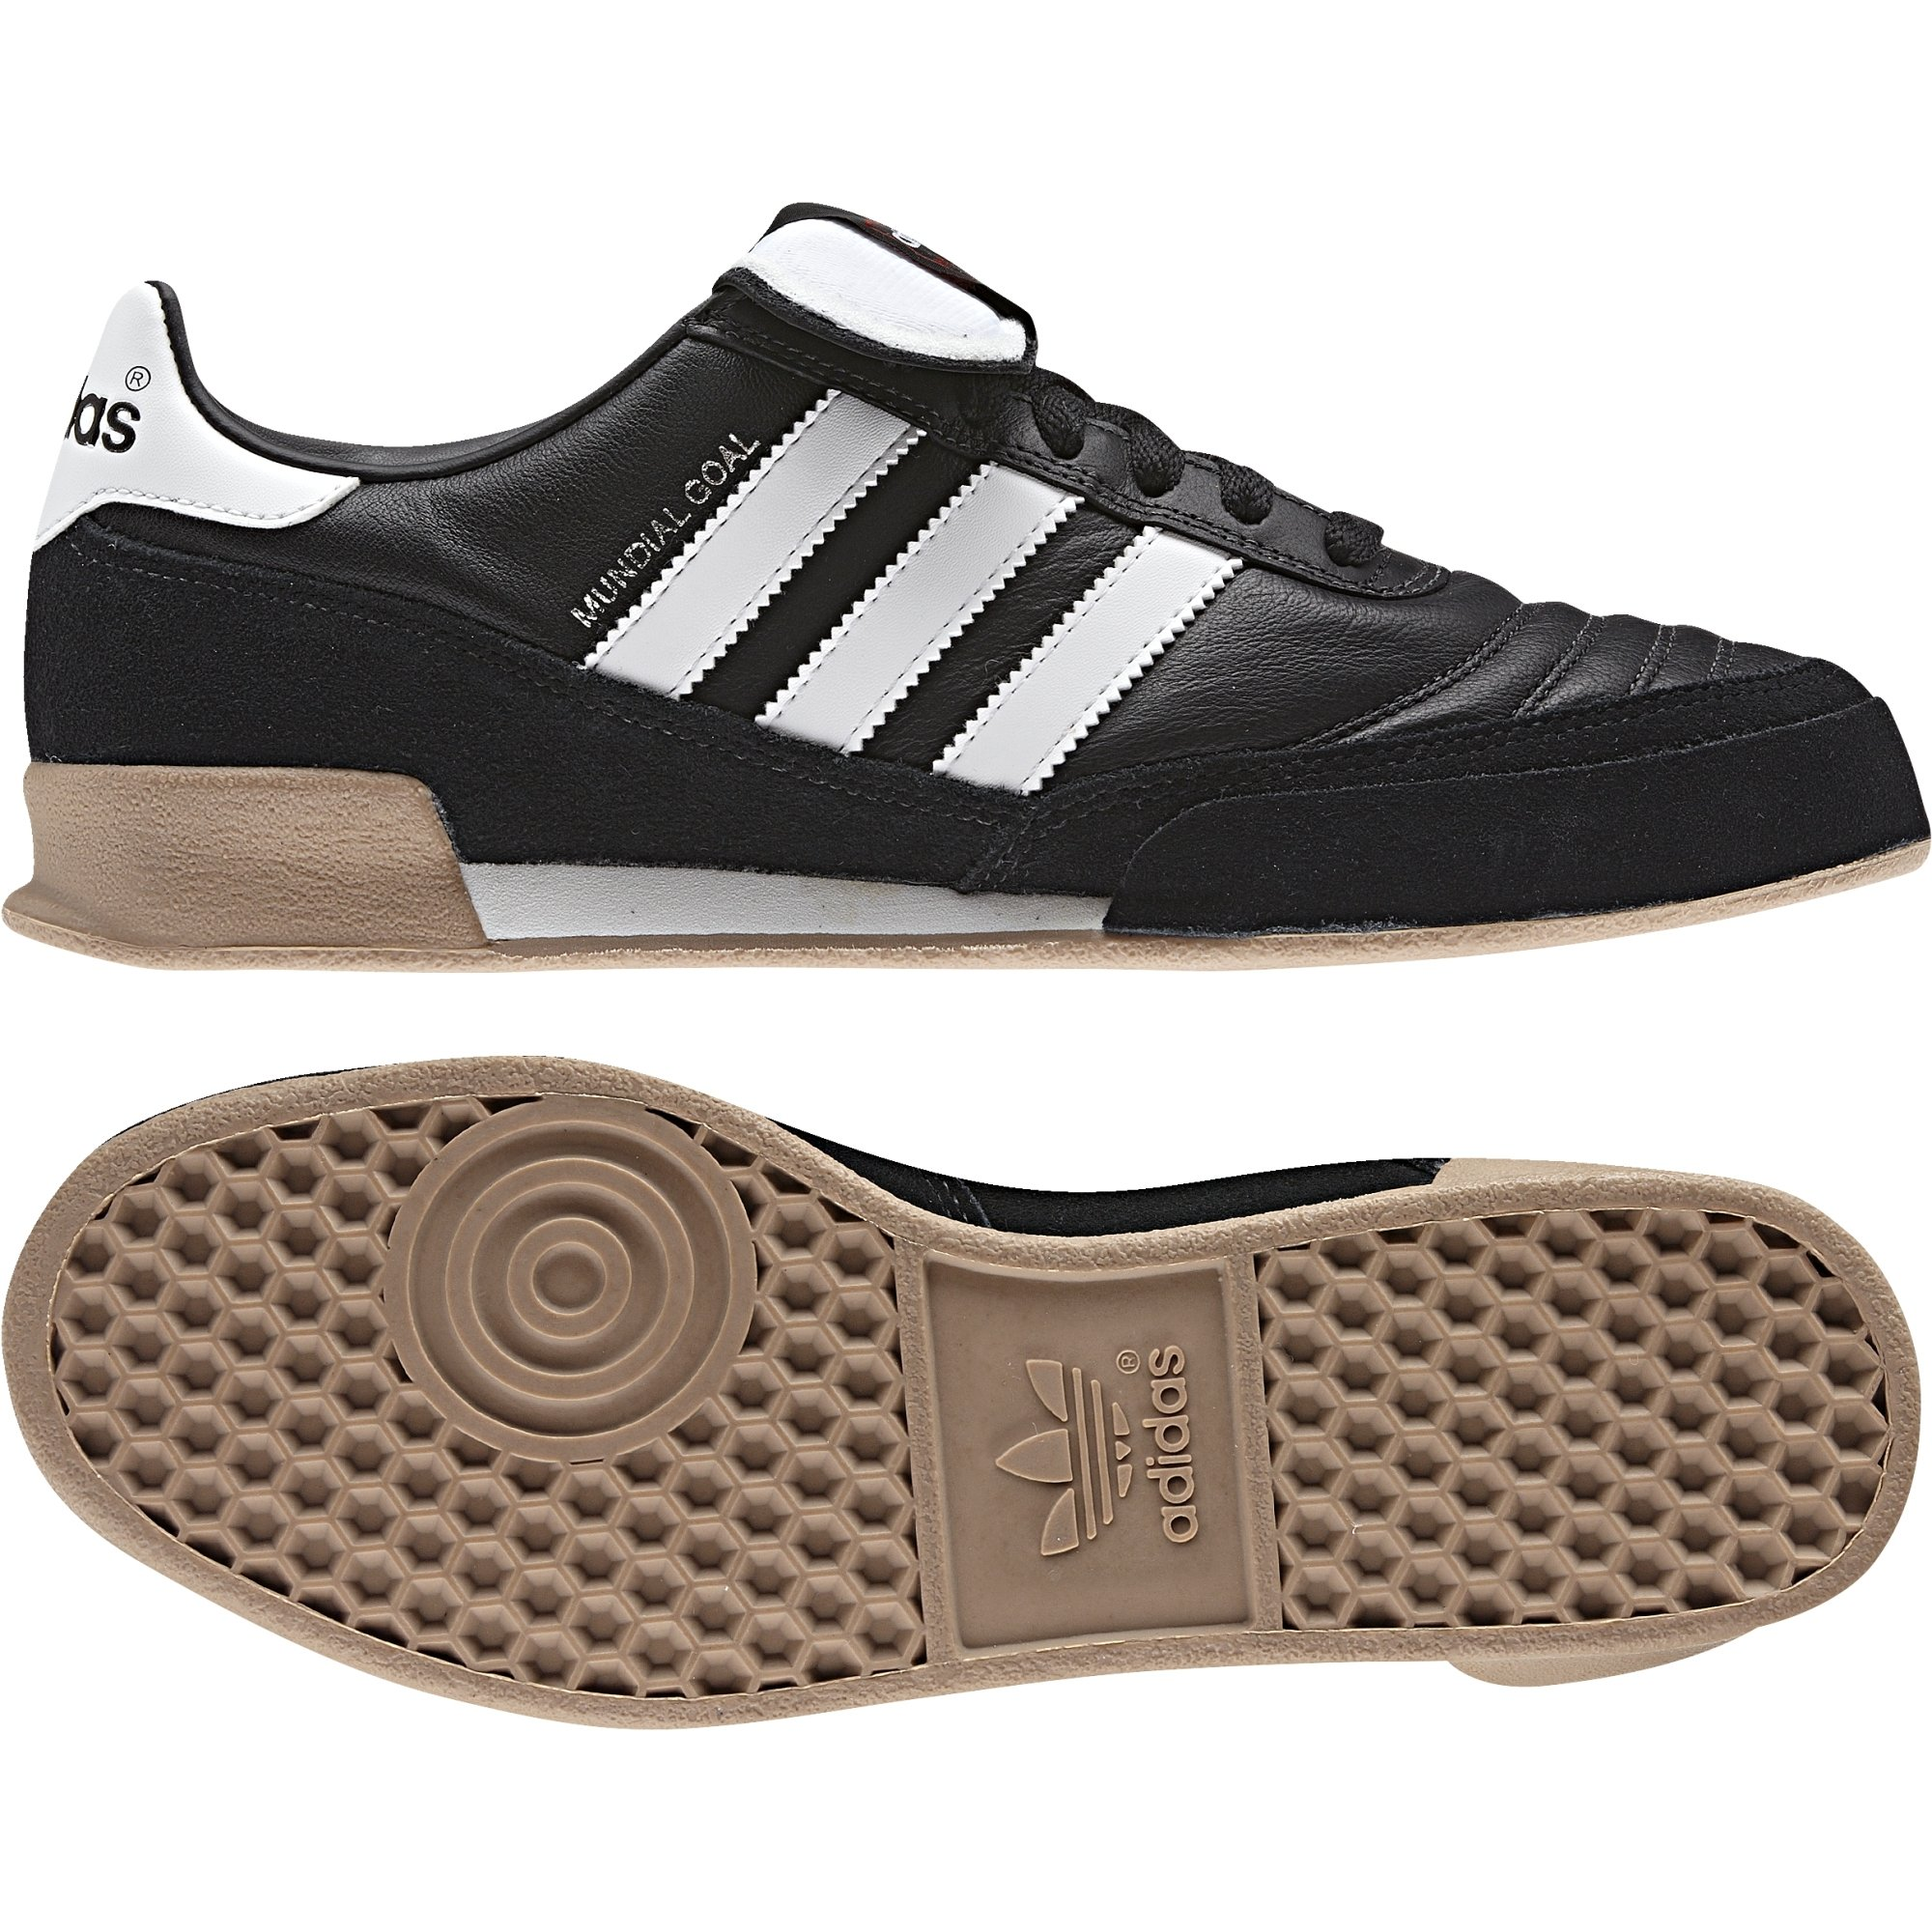 Chaussures futsal / indoor adidas Mundial Goal